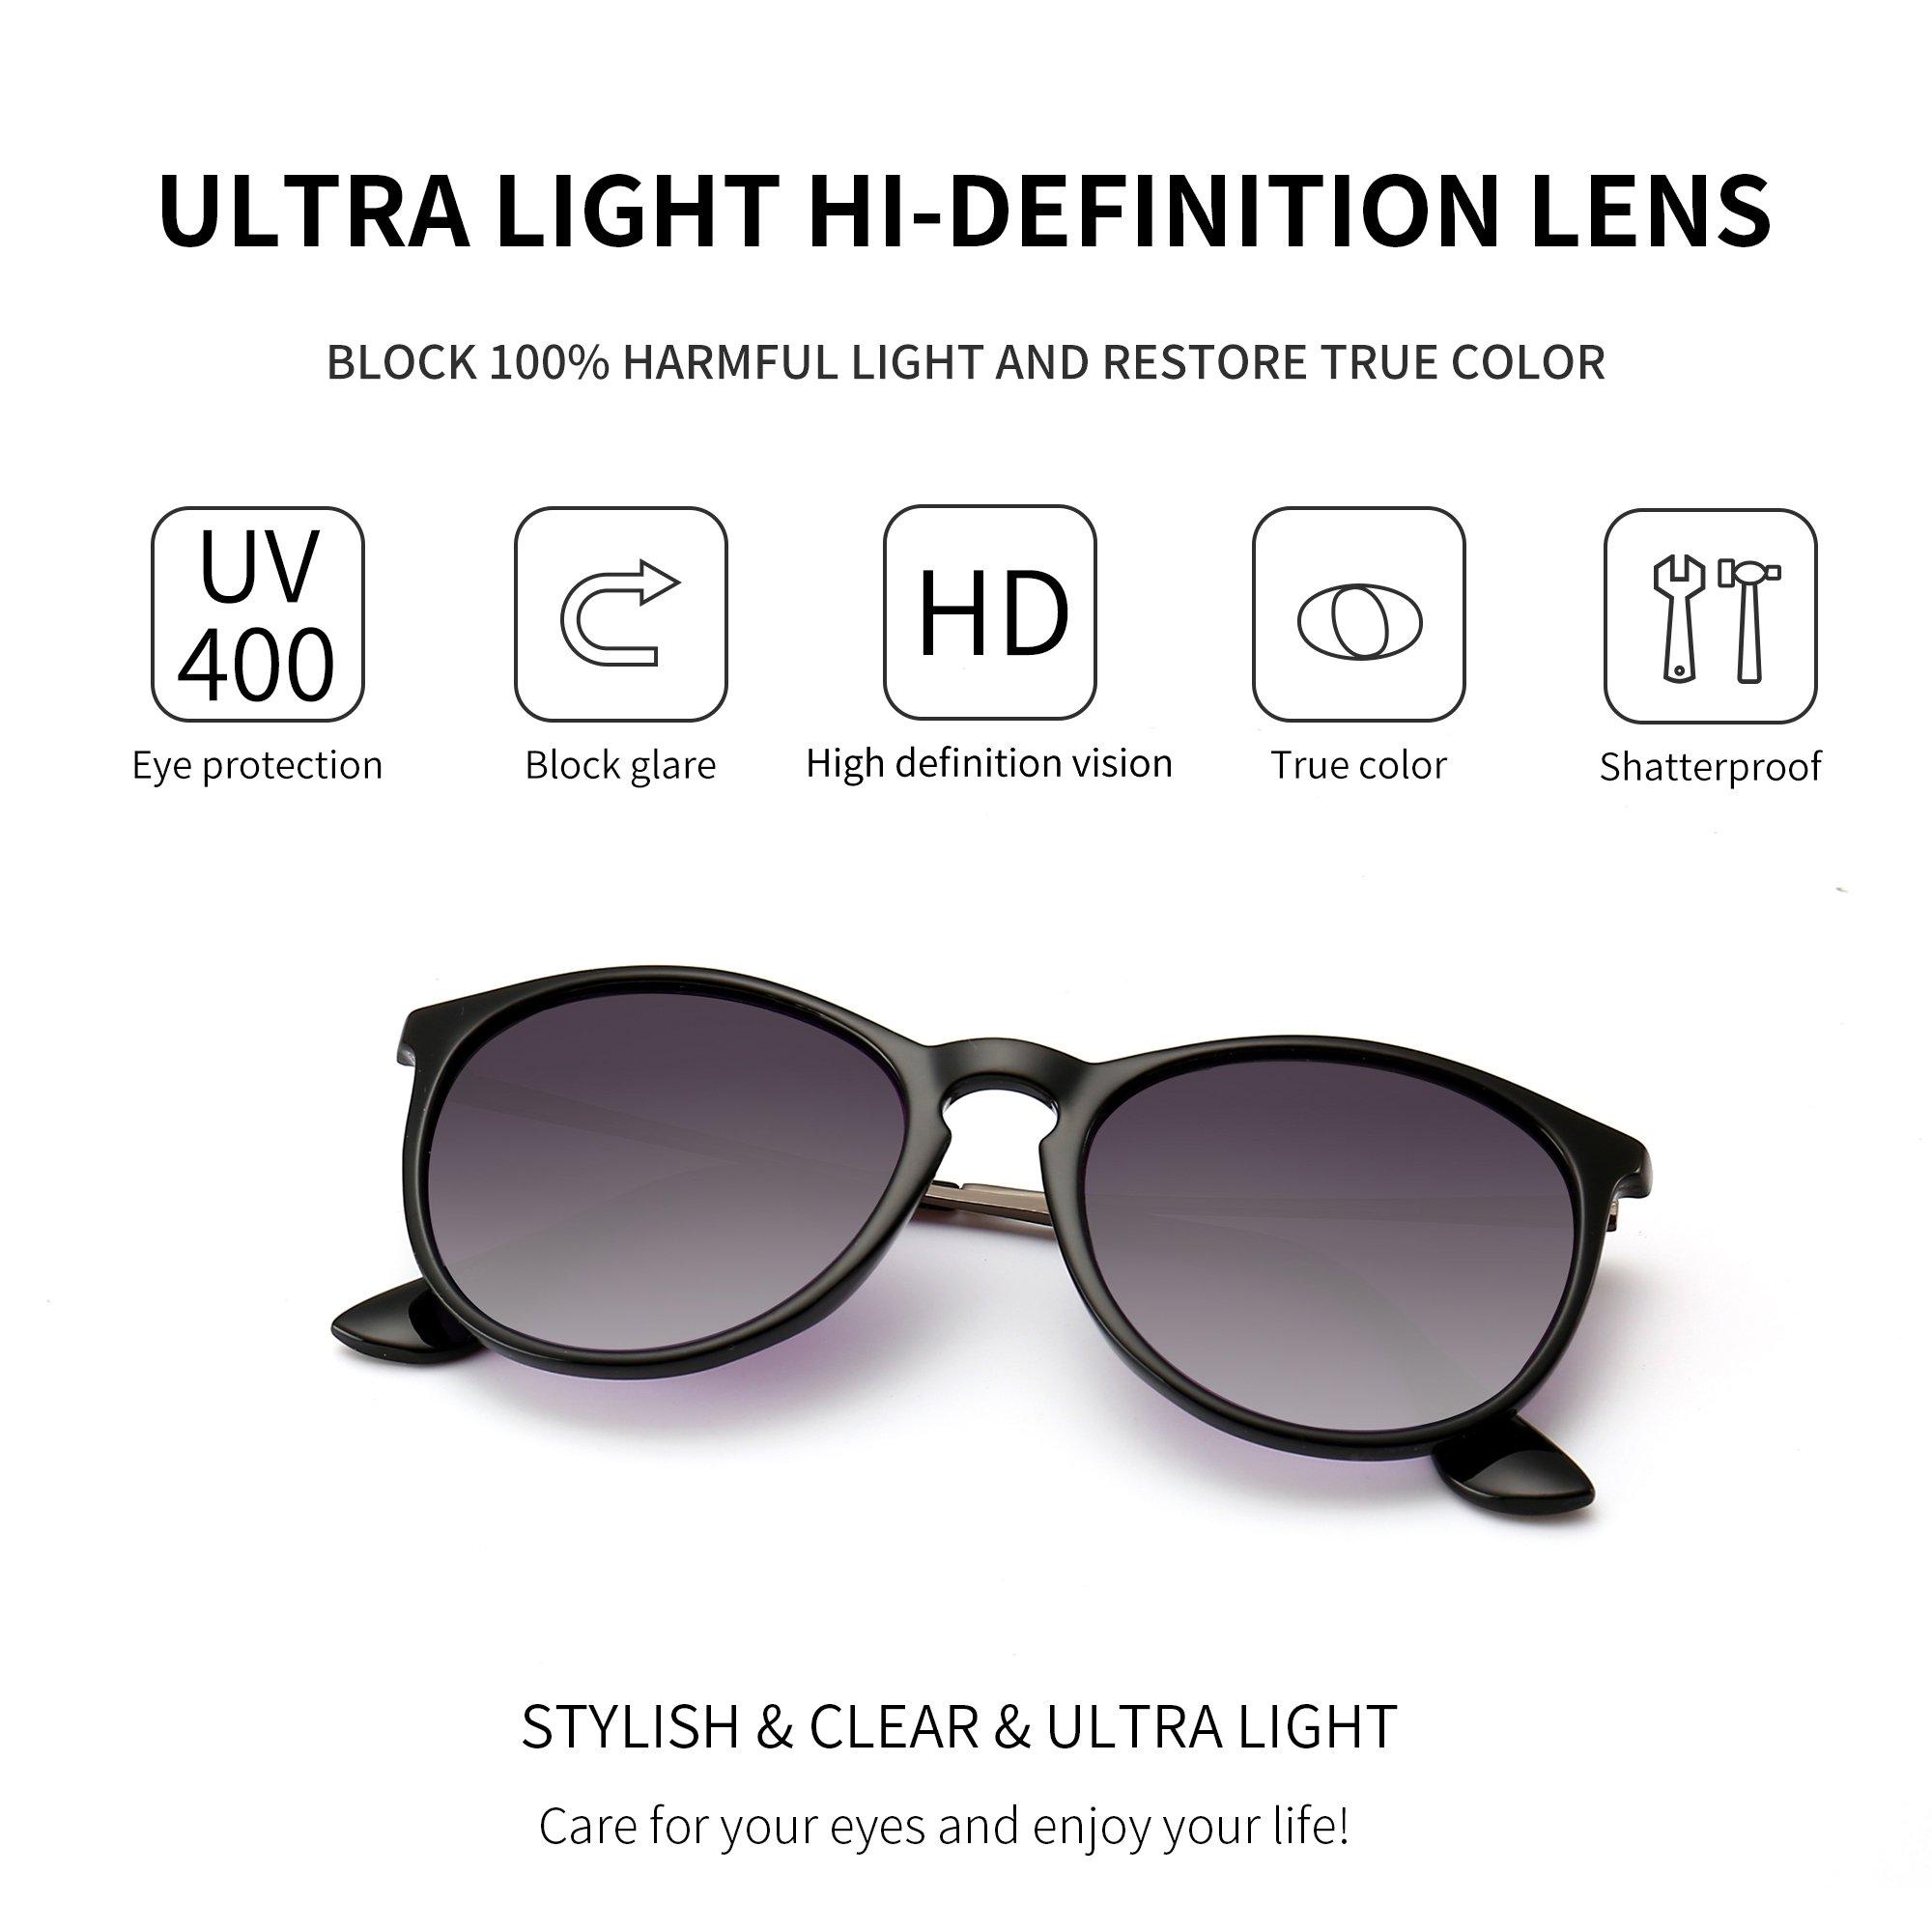 27afe189d9e SUNGAIT Vintage Round Sunglasses for Women Classic Retro Designer Style  (Black Frame Matte Finish Grey Gradient Lens)